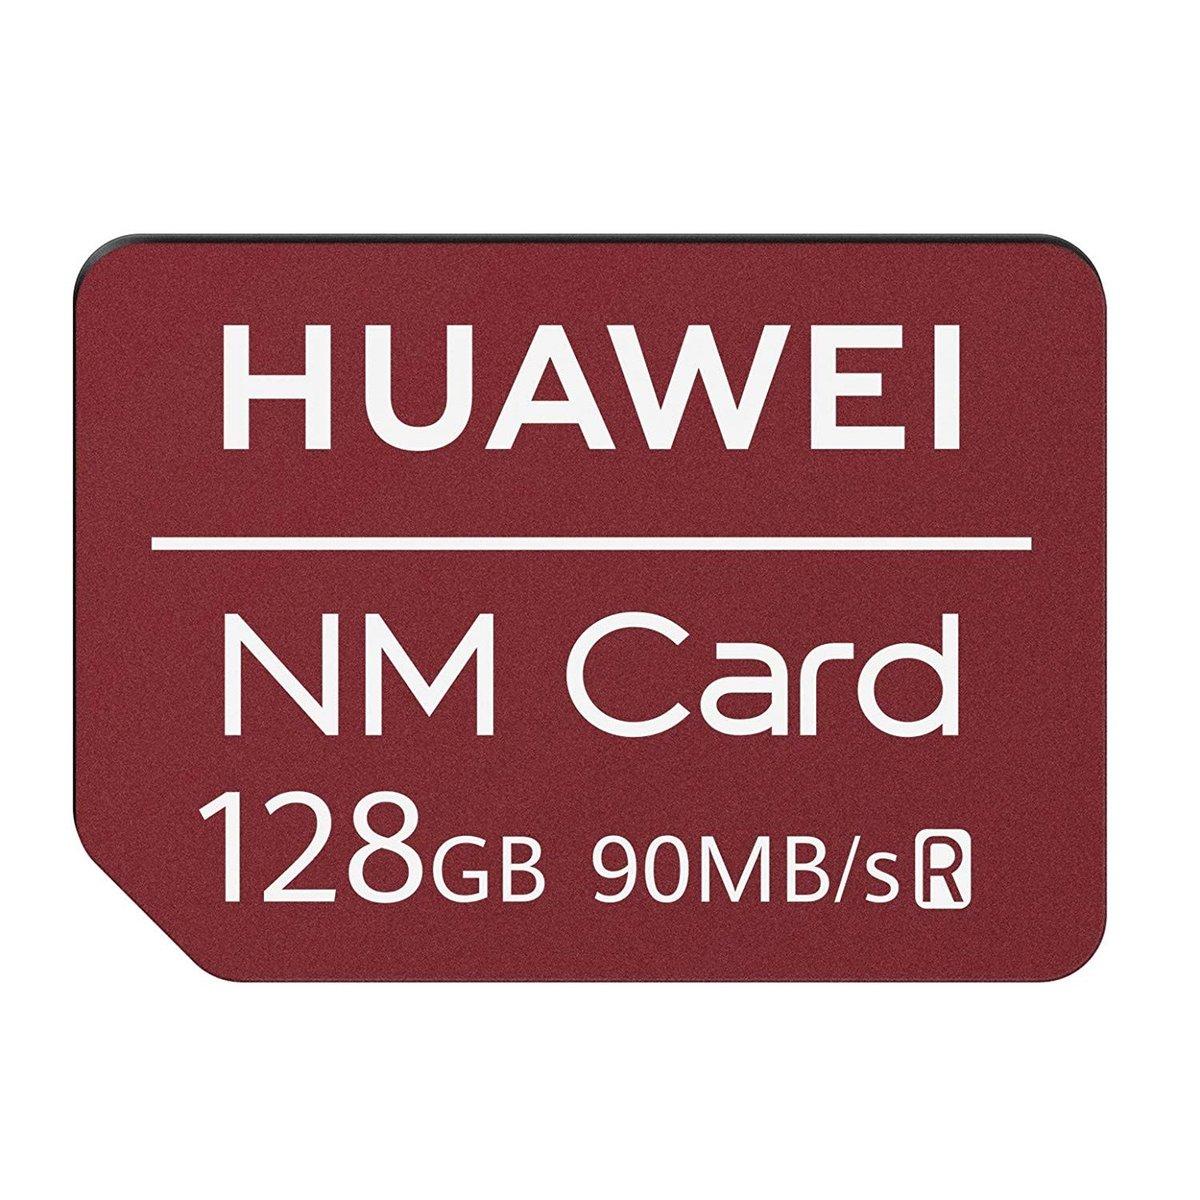 128GB NM (Nano Memory) Card Parallel import